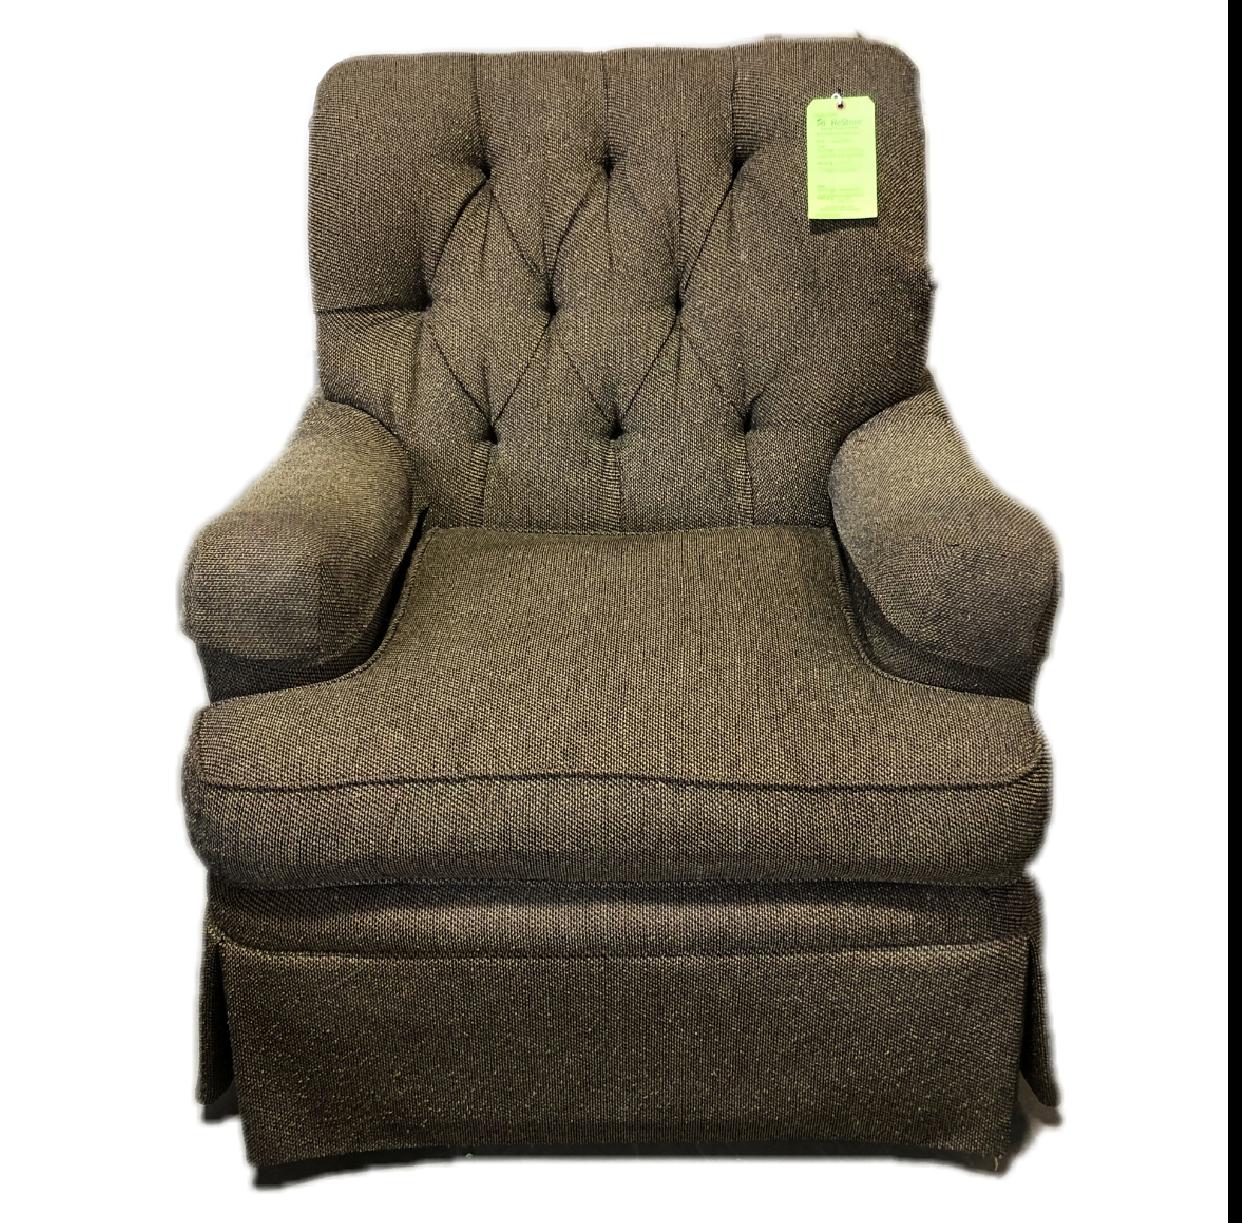 Vintage Henredon Upholstered Armchair